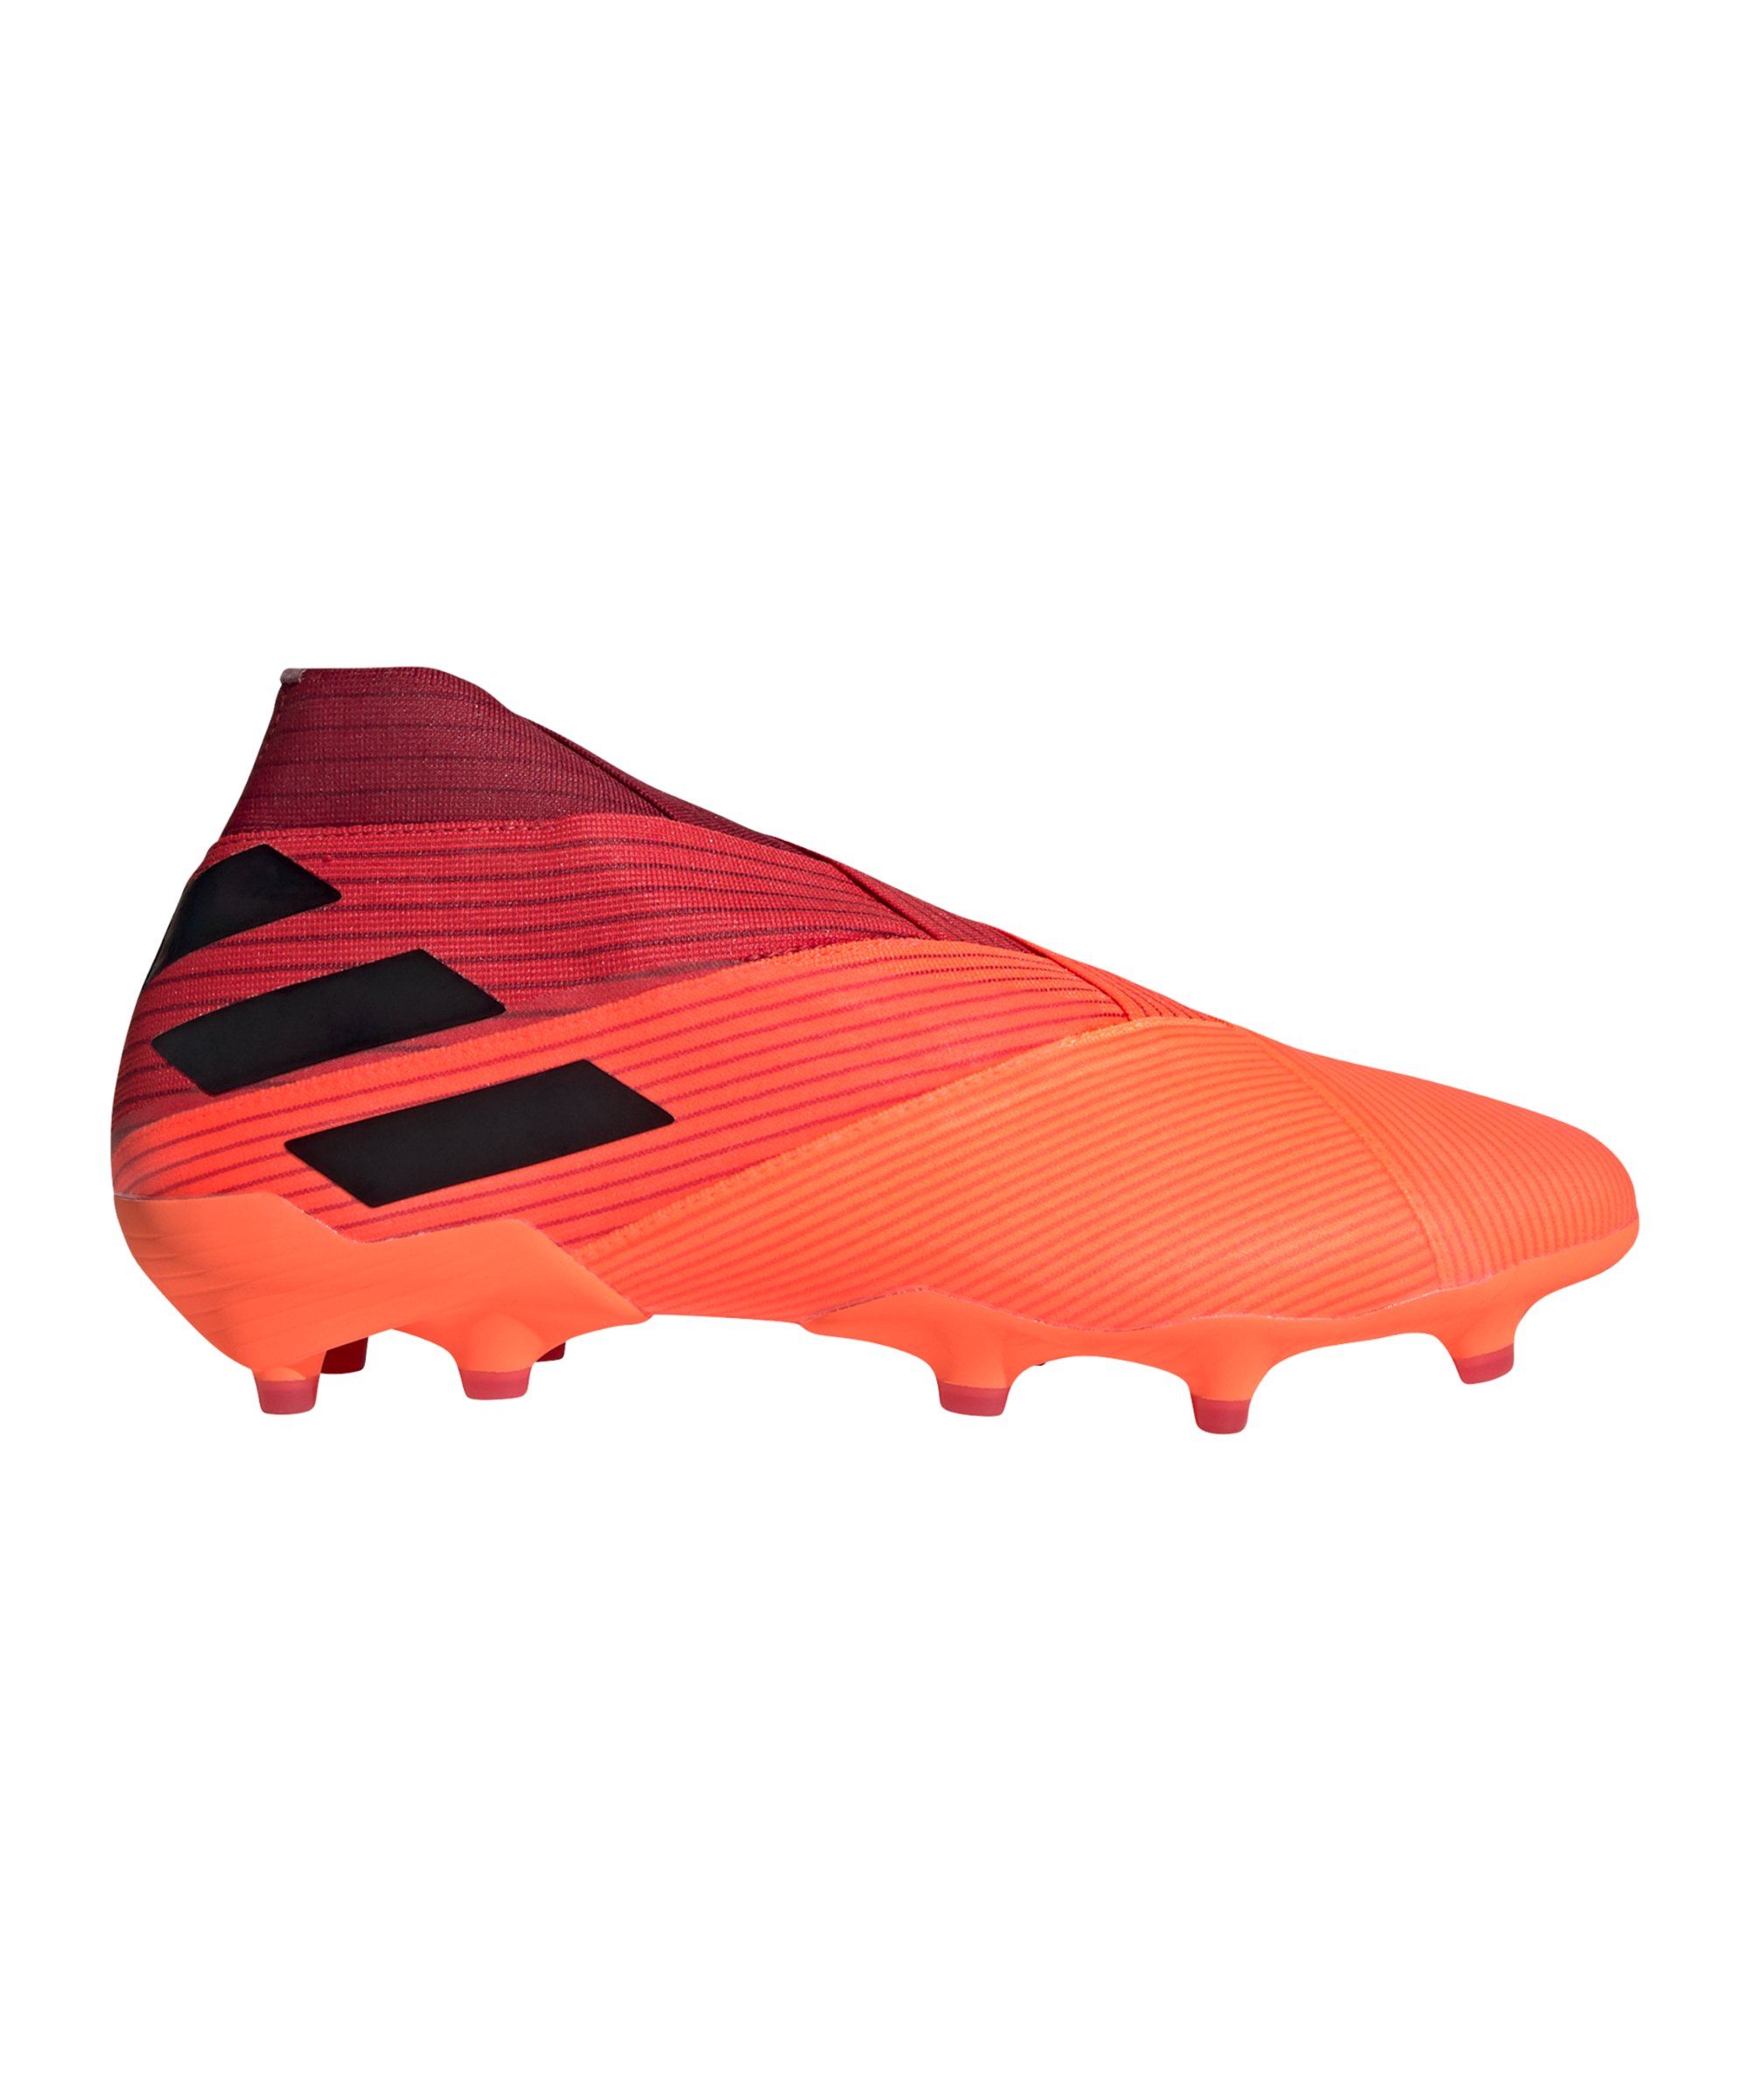 adidas NEMEZIZ Inflight 19+ FG Orange - orange